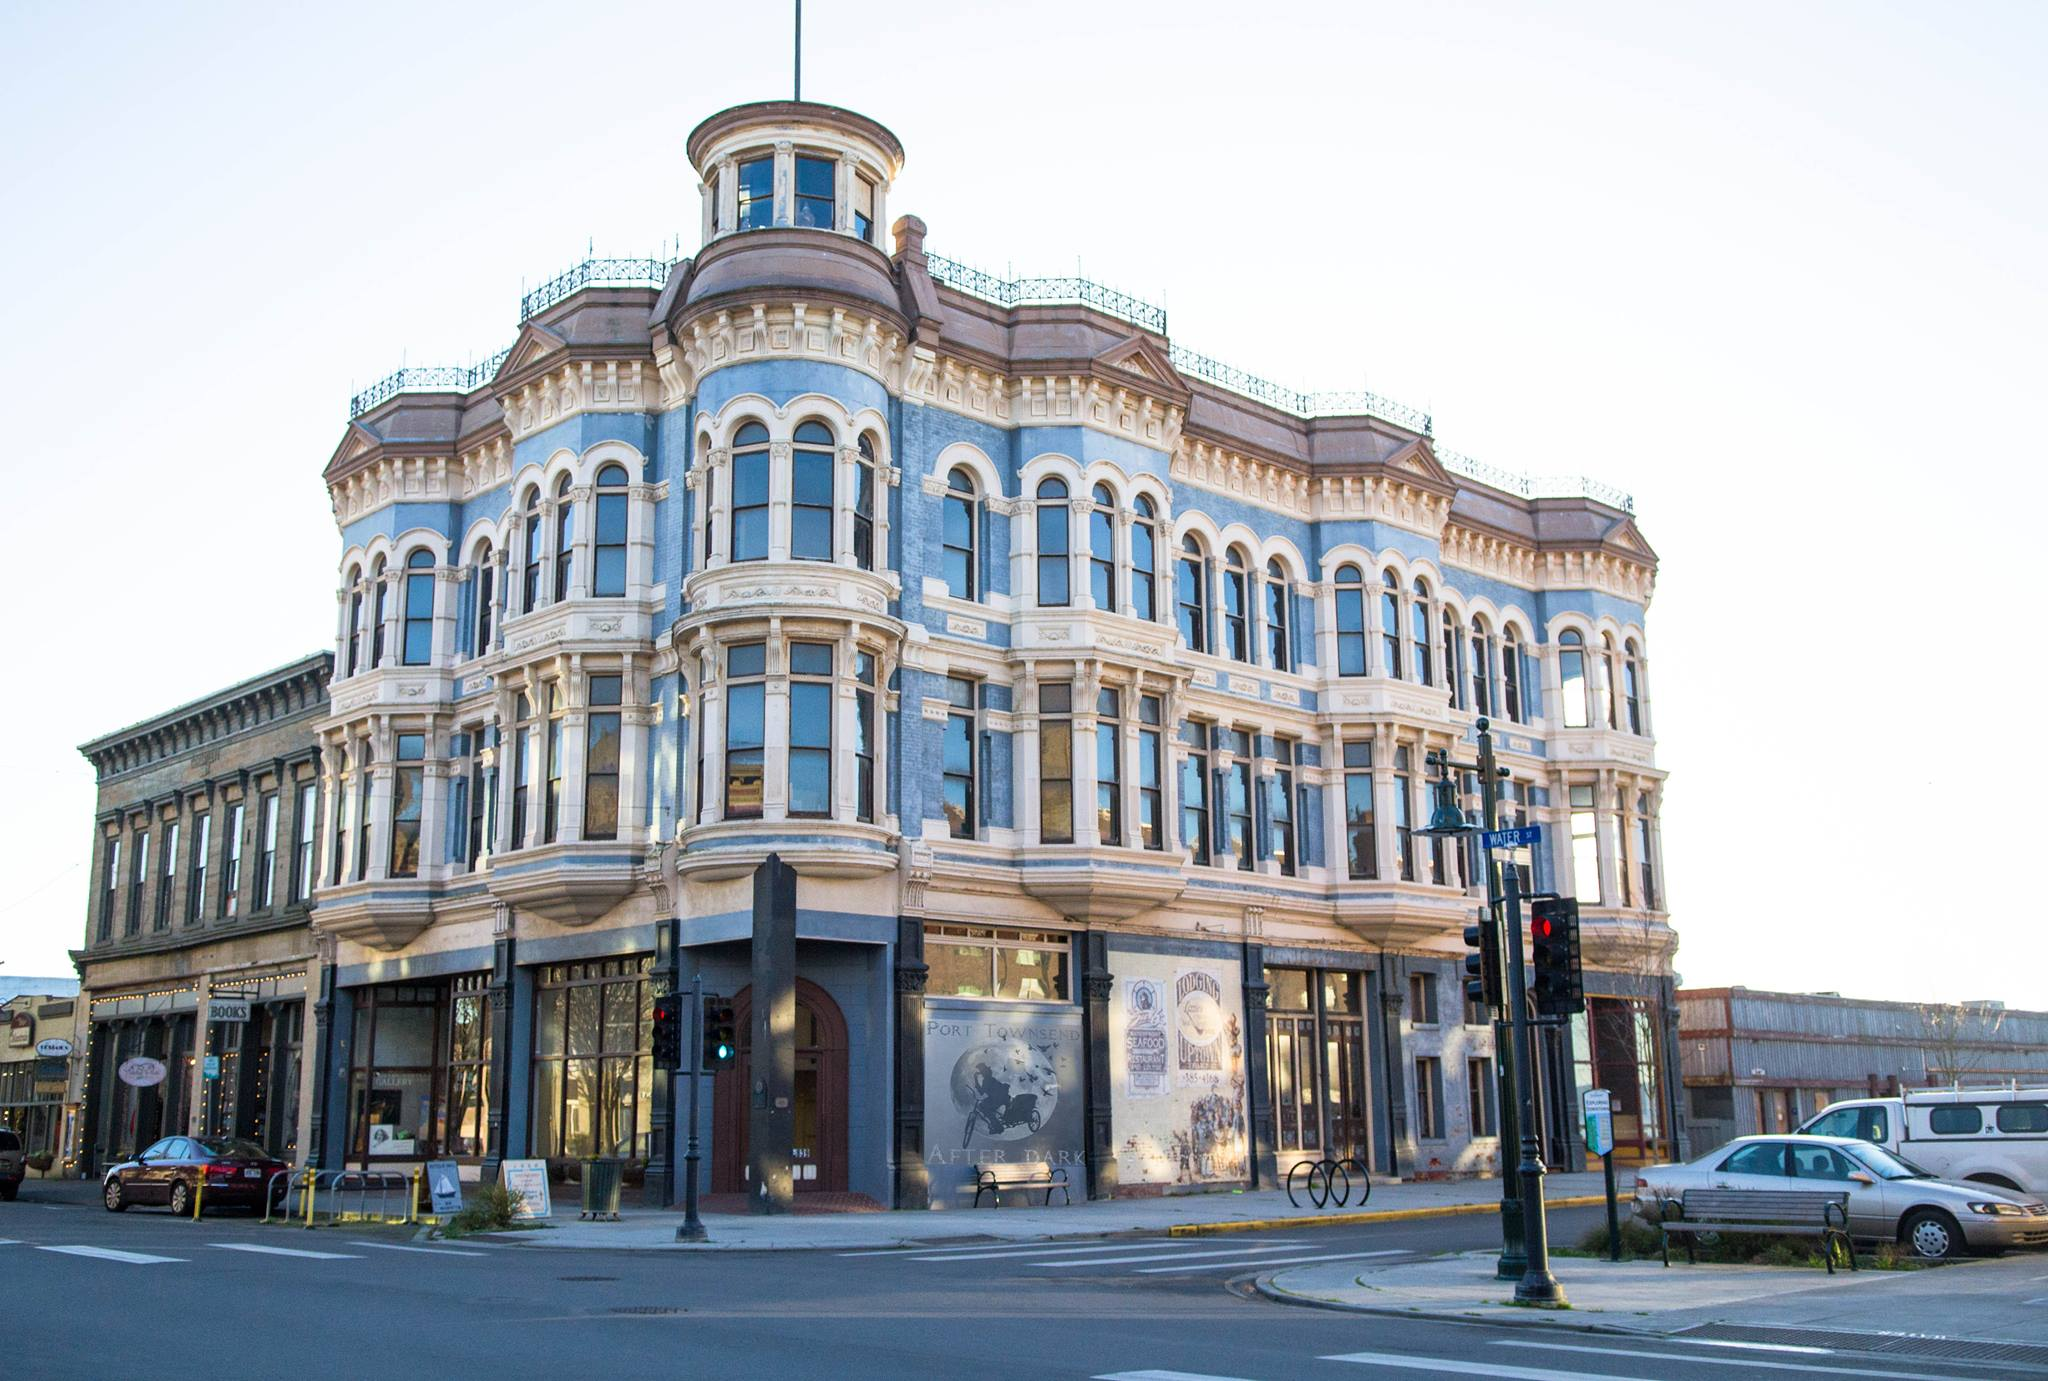 Victorian building in Port Townsend, Washington